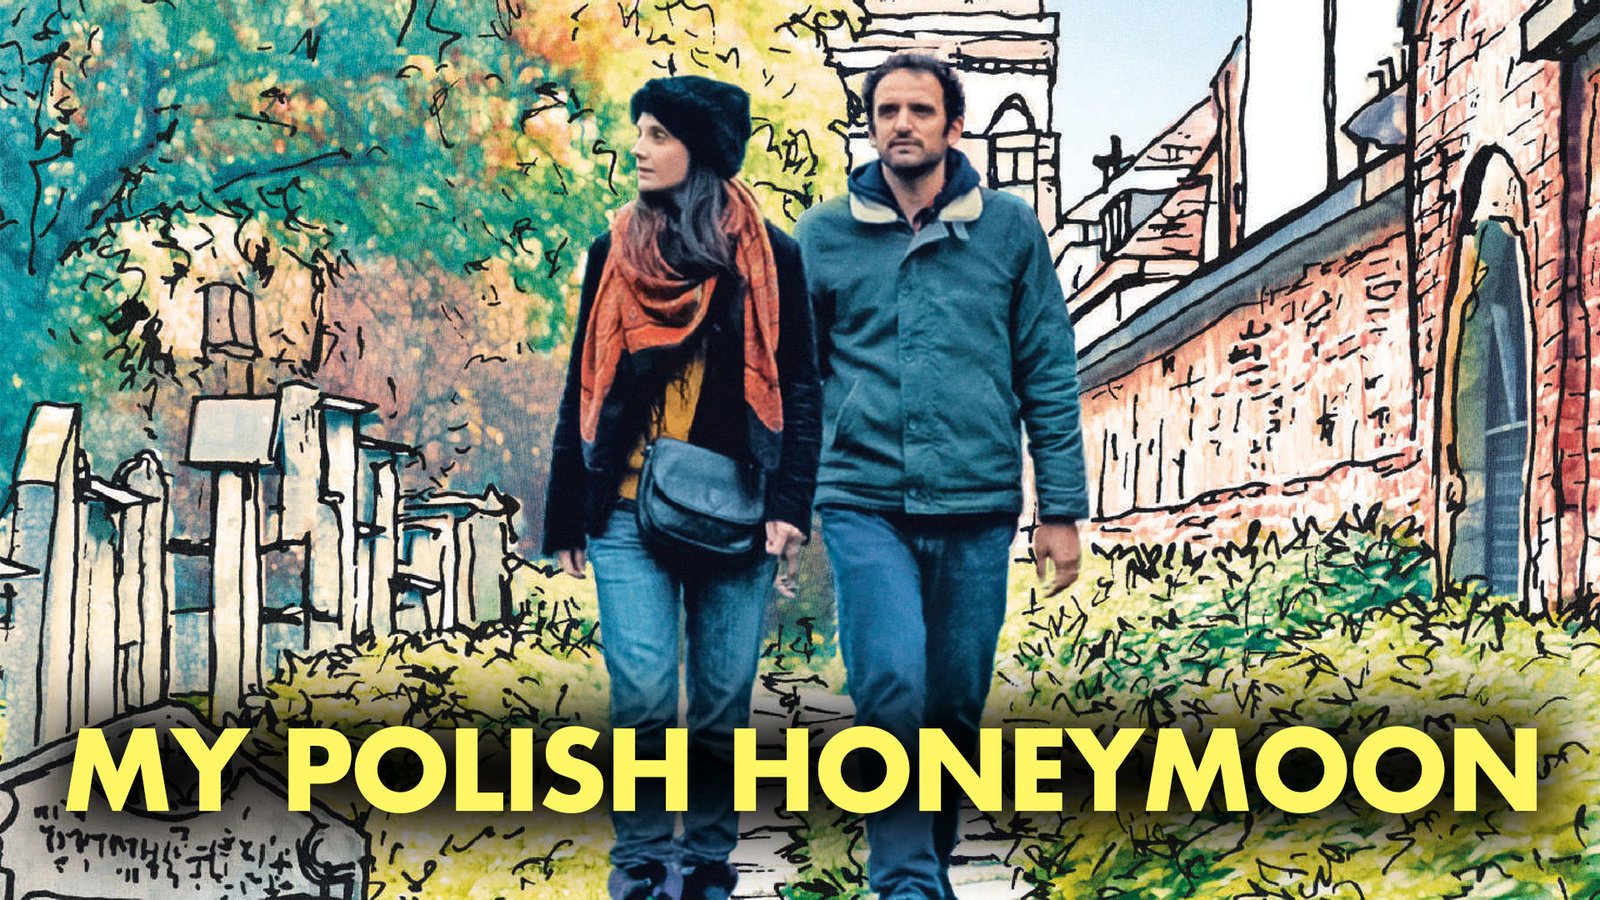 My Polish Honeymoon - Lune de miel